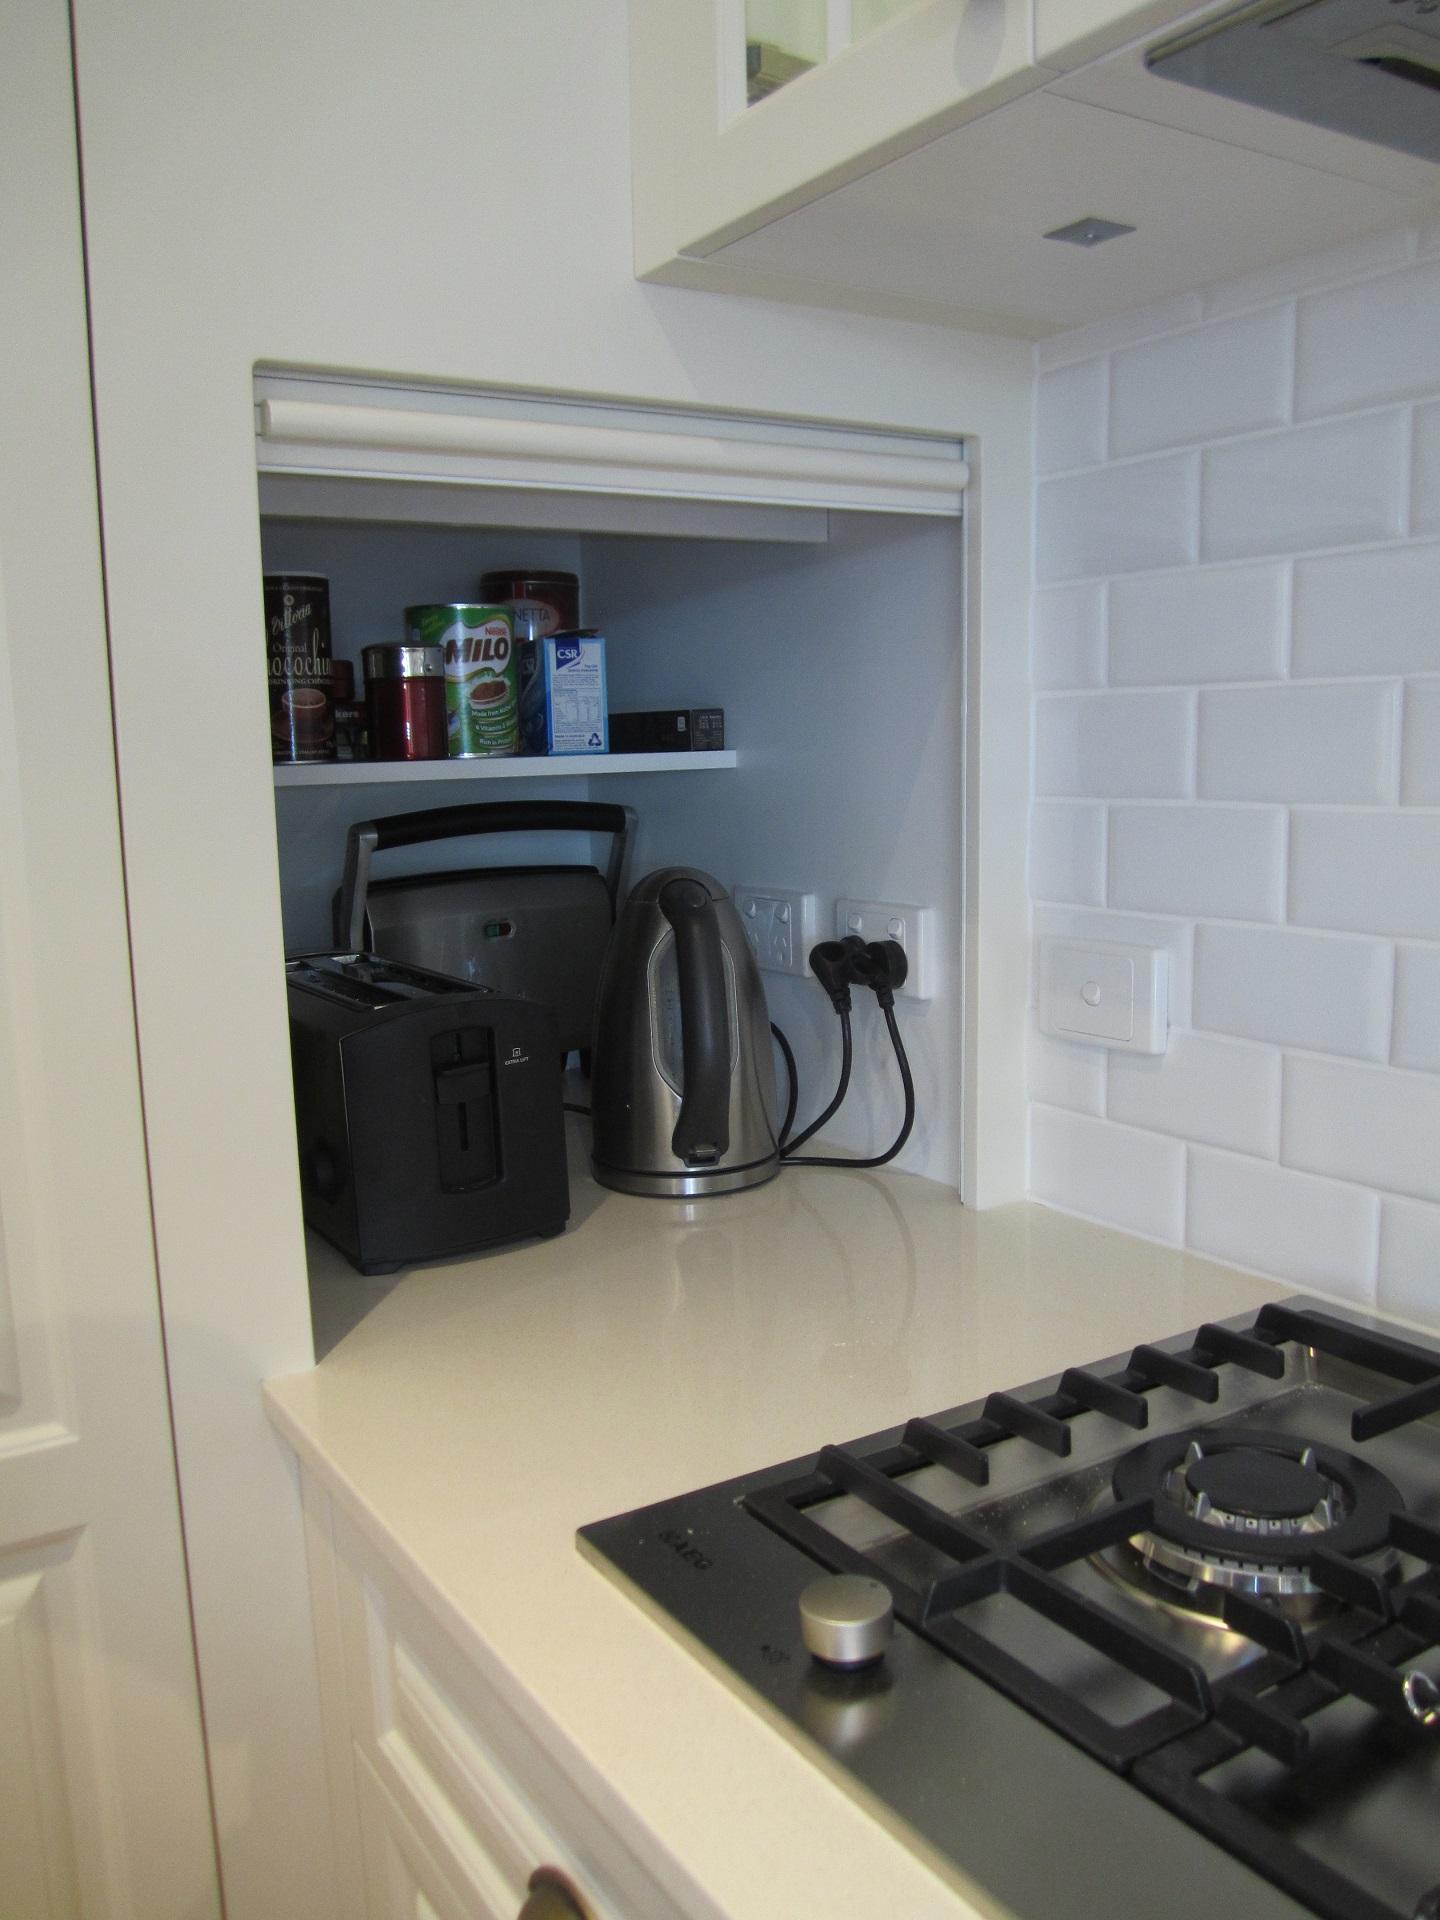 Brisbane Kitchen Design Sydney St Camp Hill  Traditional Kitchen Renovation Appliance Cupboard in Pantry (7)